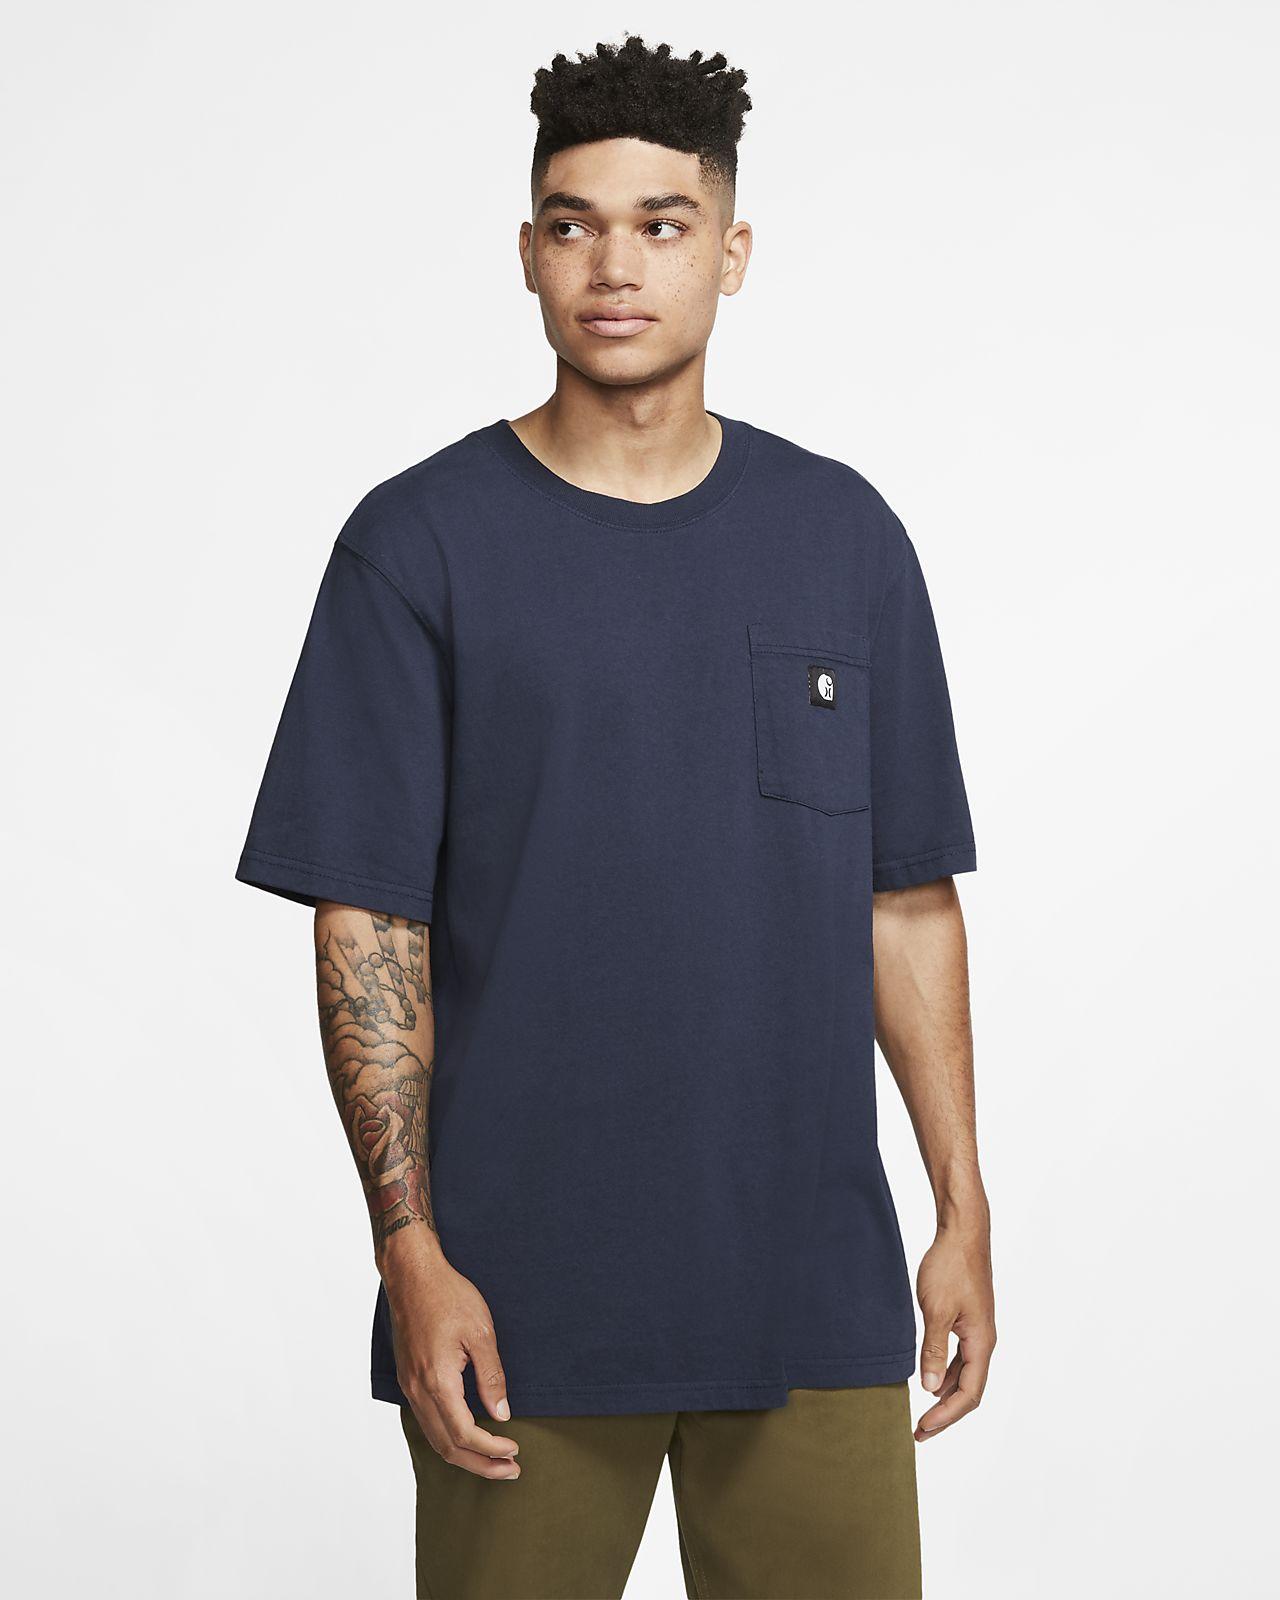 Hurley x Carhartt Men's T-Shirt